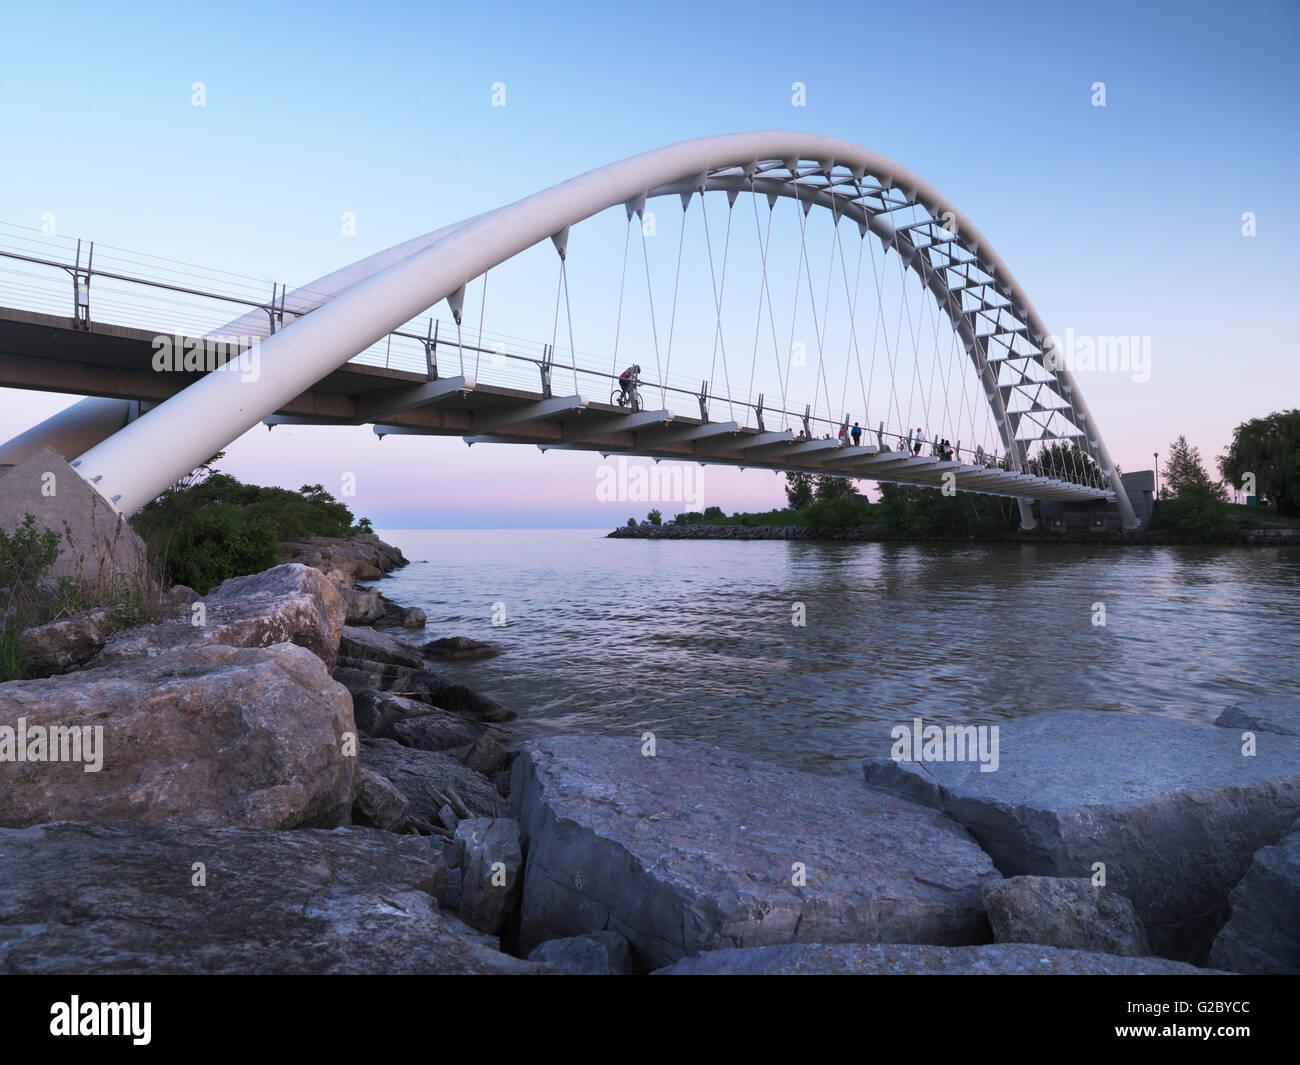 Humber River-Bogen-Brücke, Toronto, Provinz Ontario, Kanada Stockbild